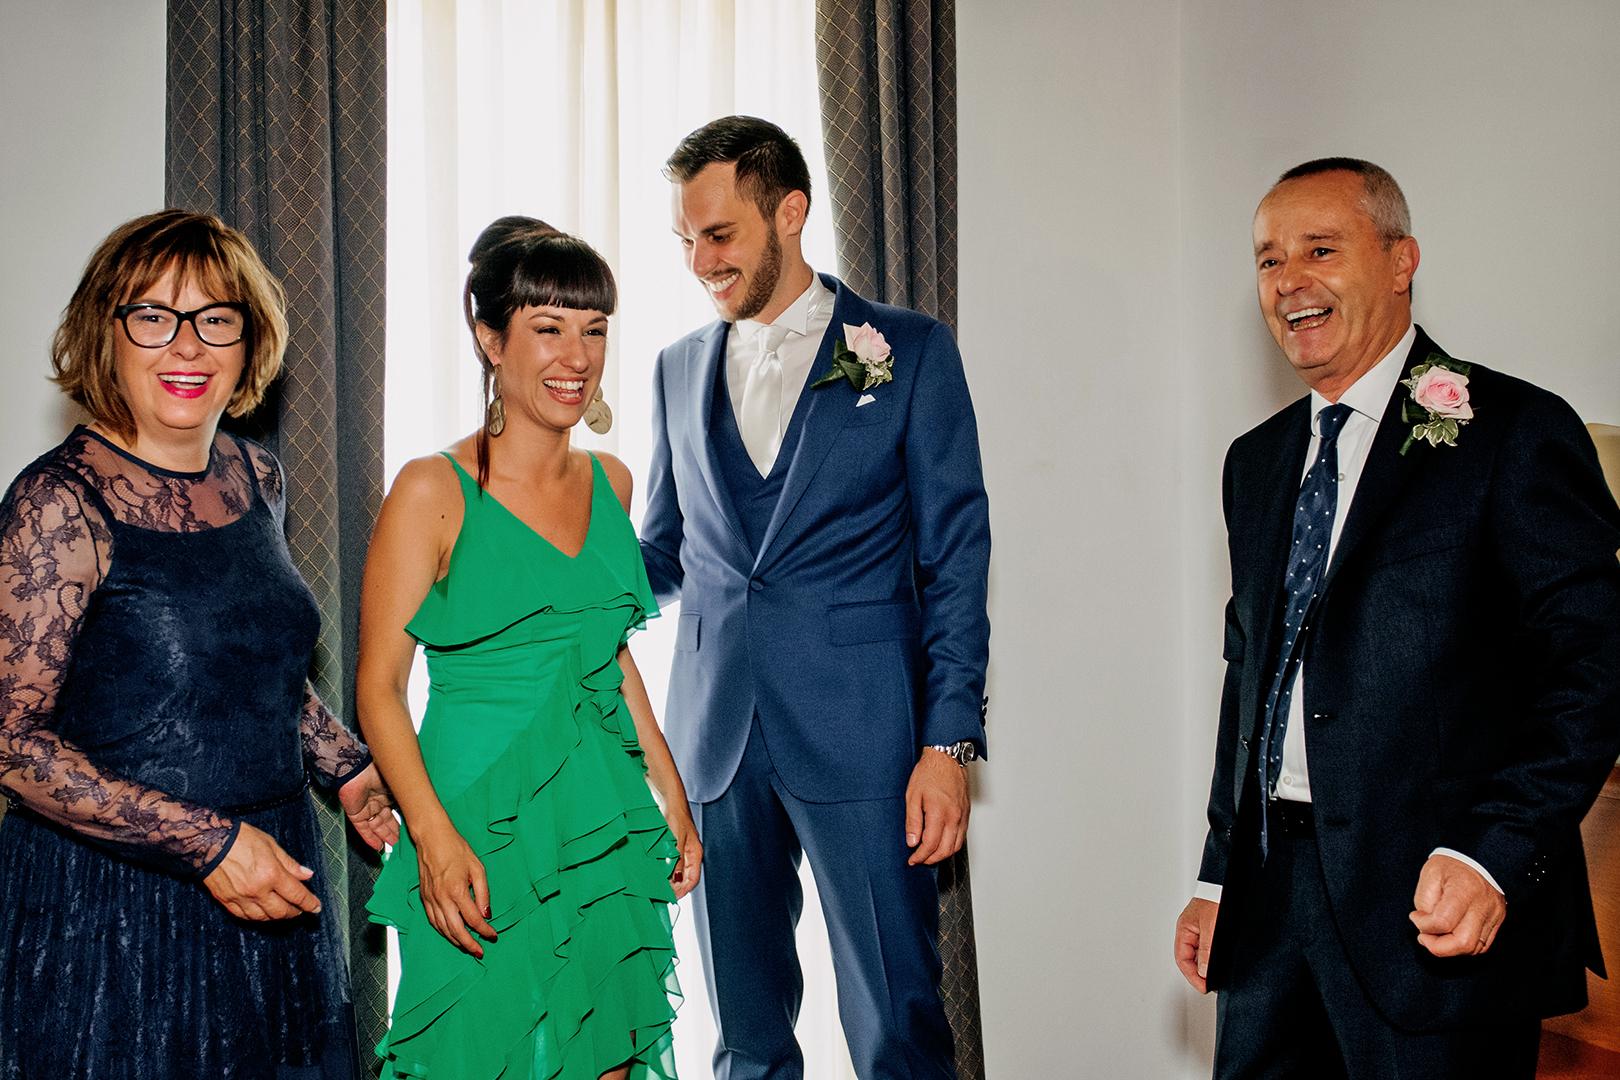 15 gianni-lepore-wedding-sposo-groom-foto-famiglia